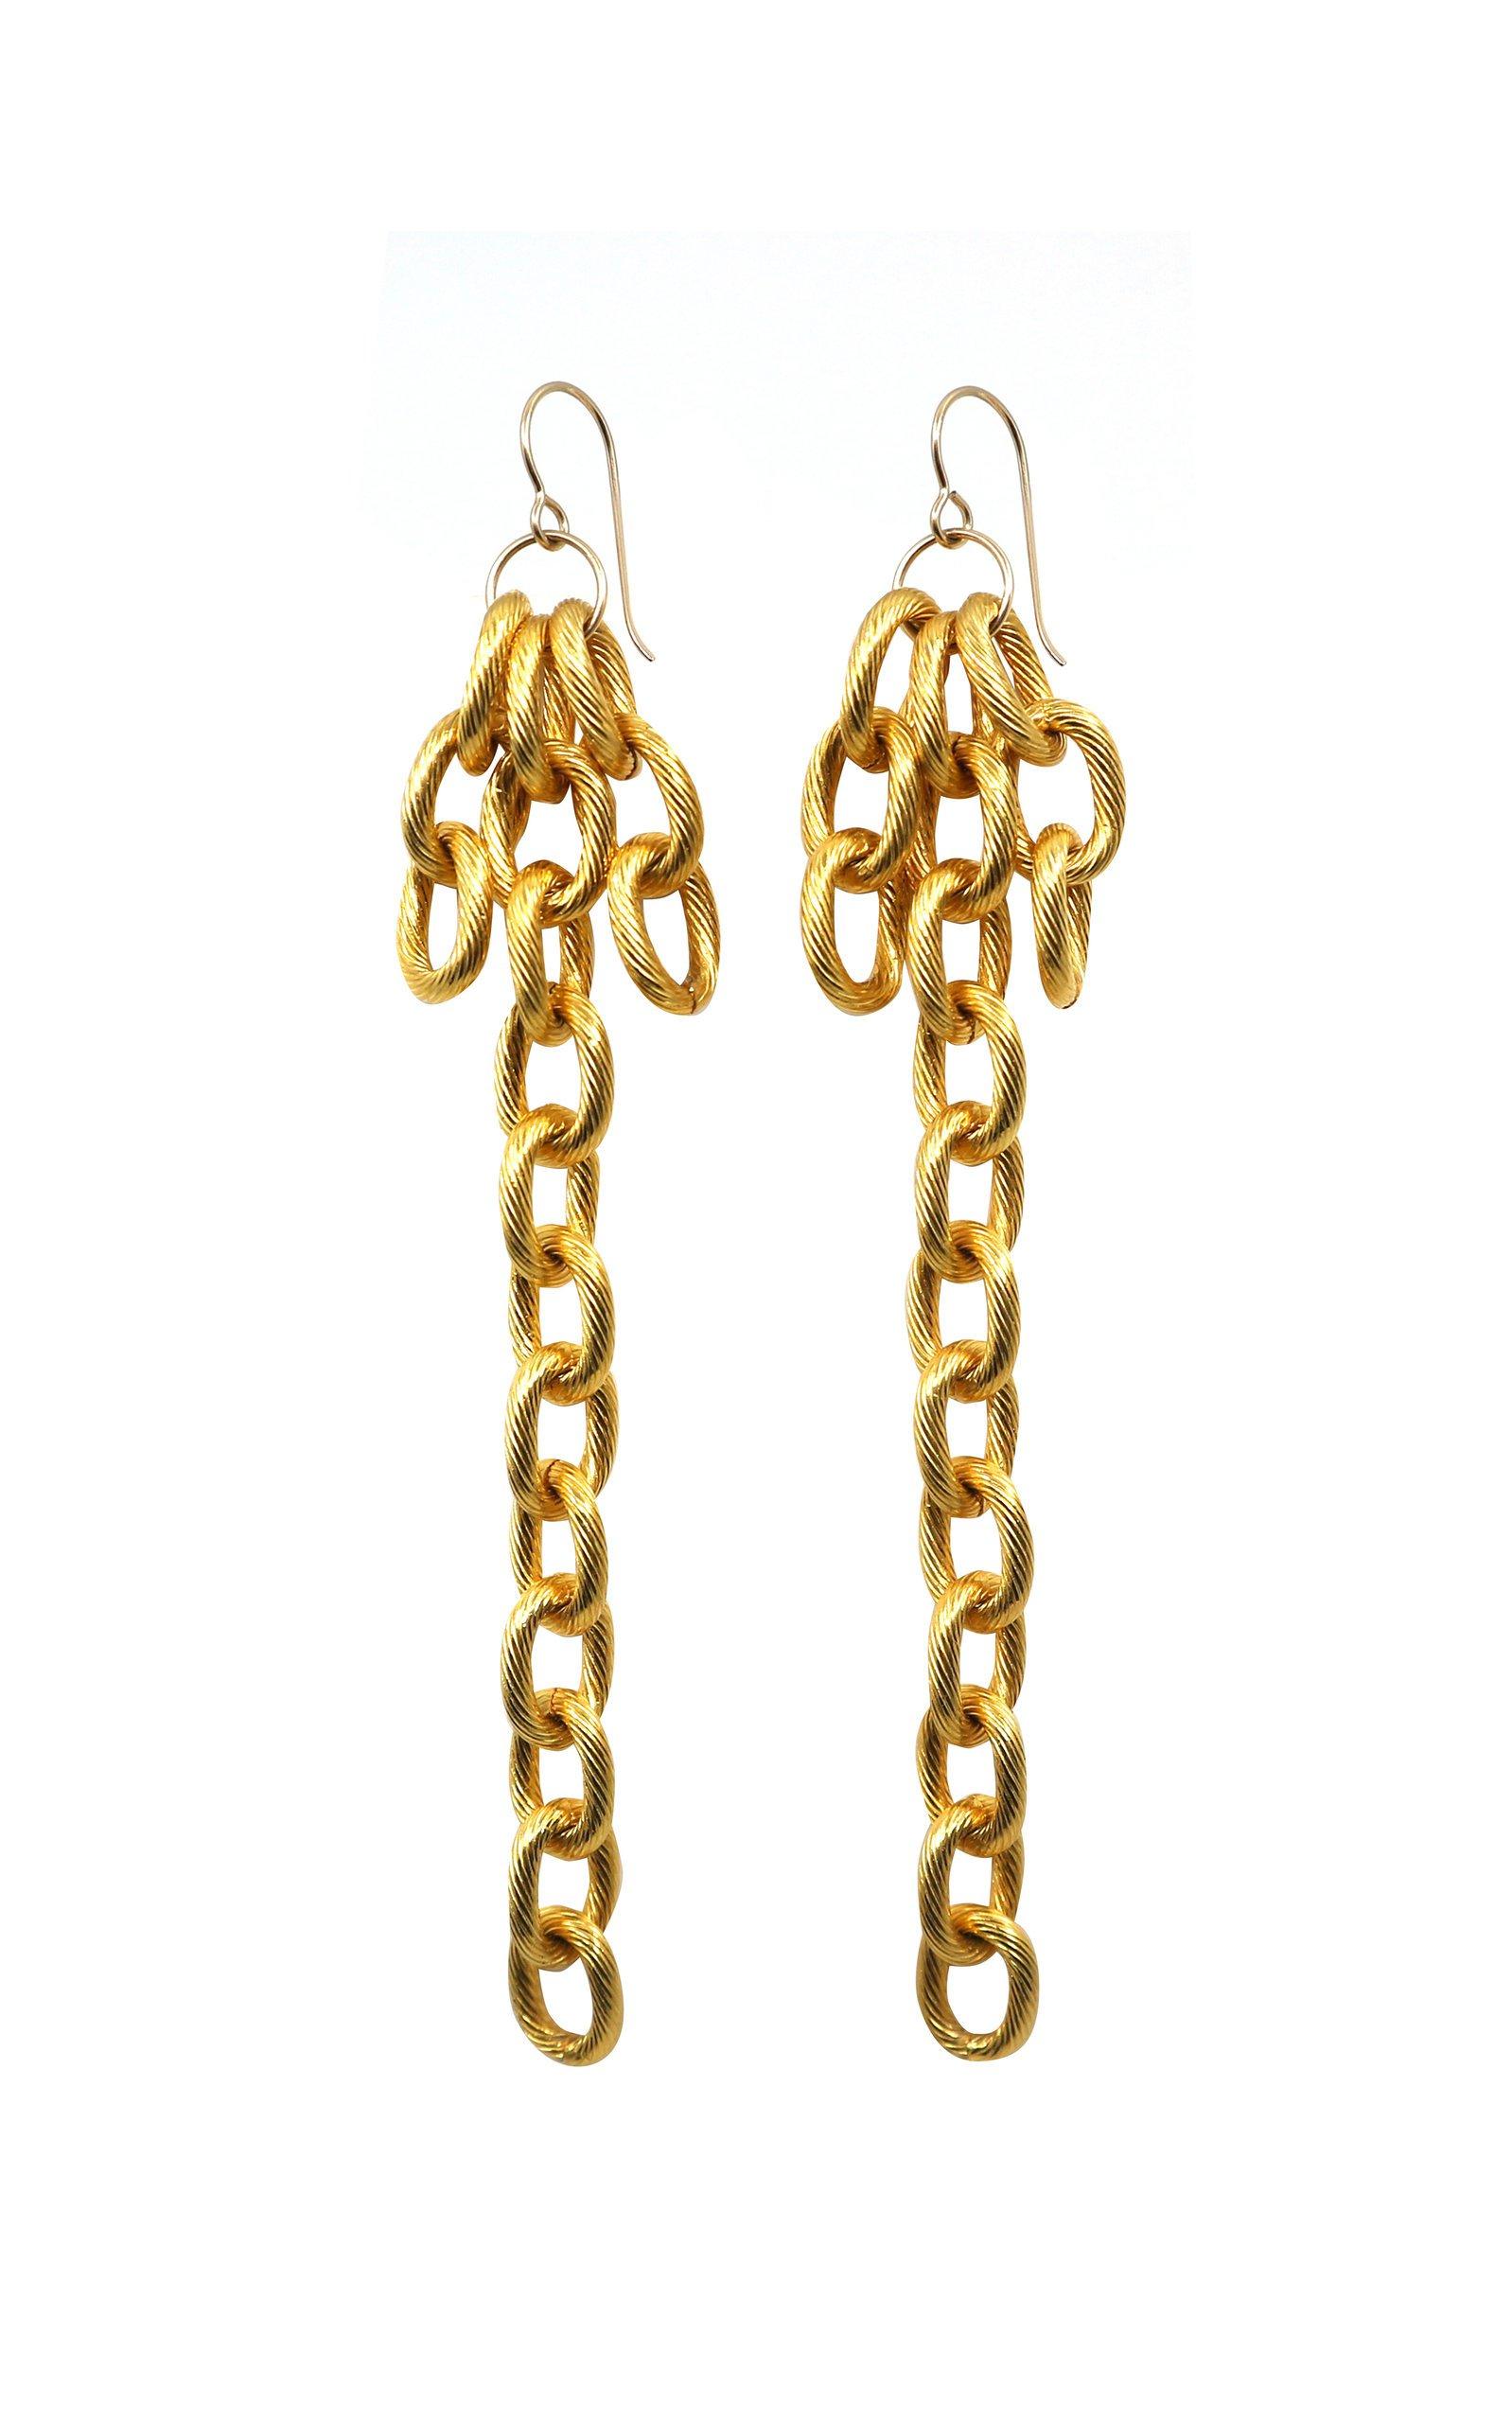 Petite Grand x Bondi Born Blair Chain Earrings